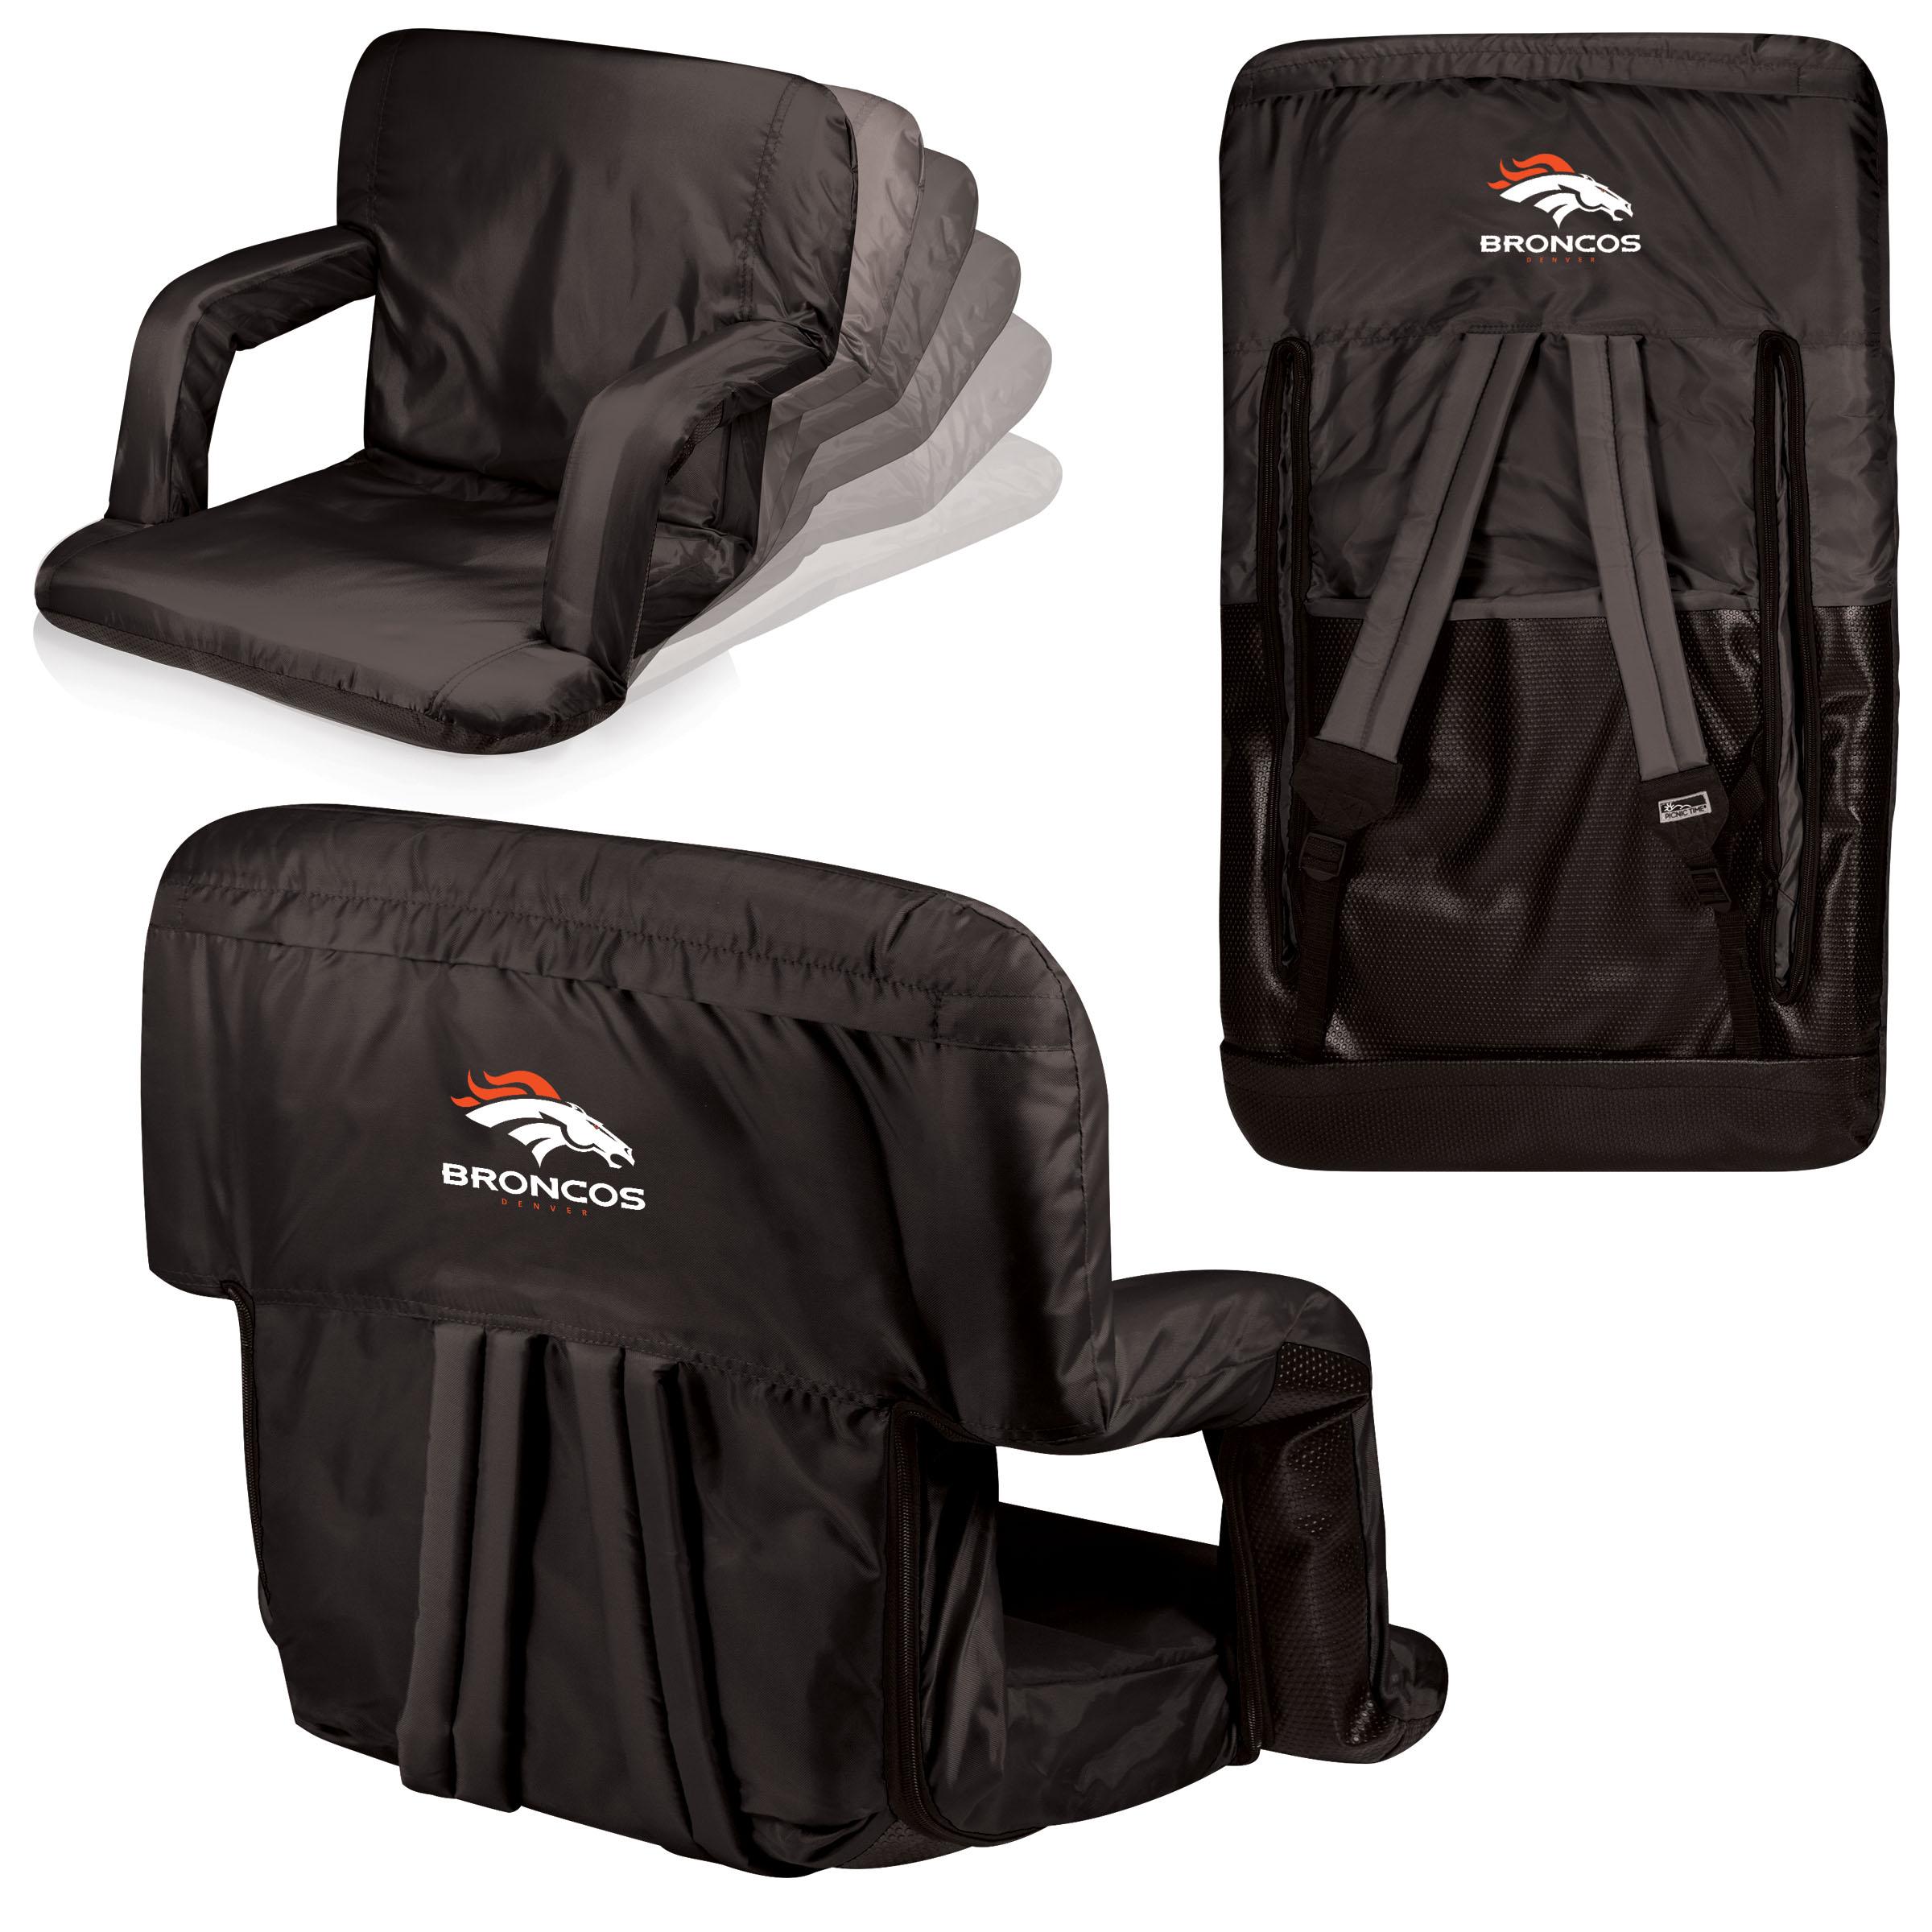 Denver Broncos Ventura Seat Portable Recliner Chair - Black - No Size